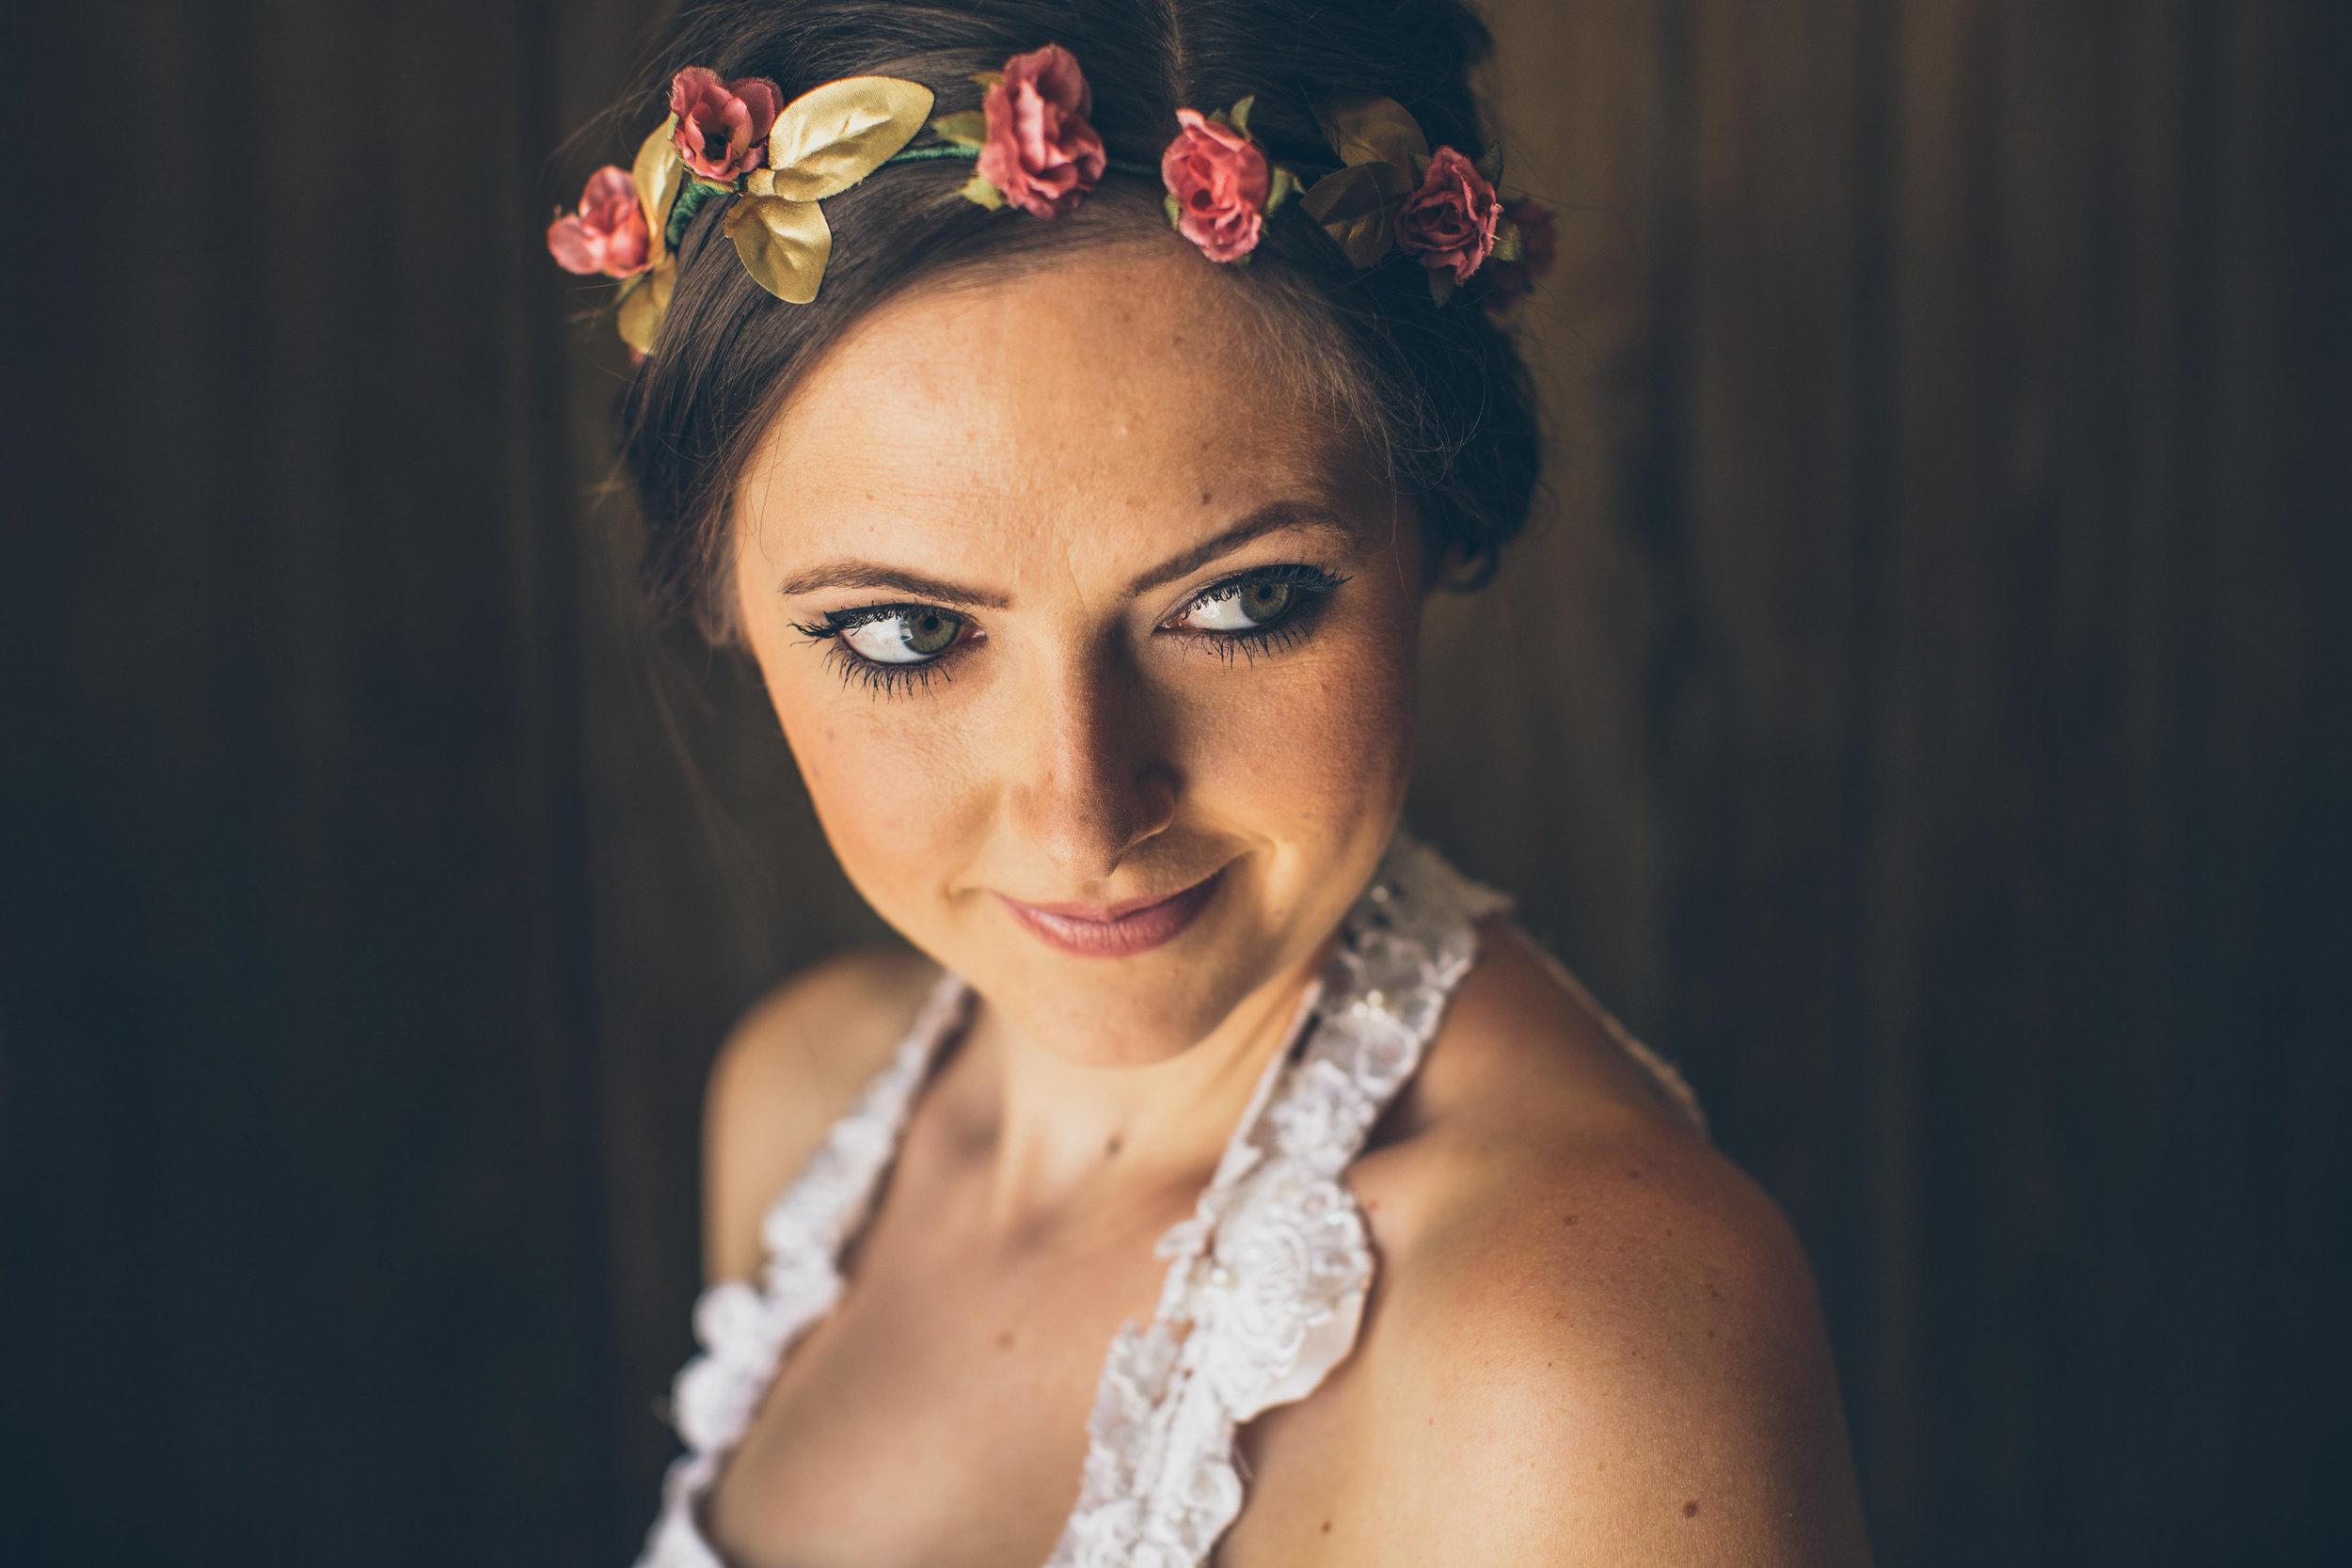 20141024-DePartee-Wedding-APavone-007-sm-2.jpg